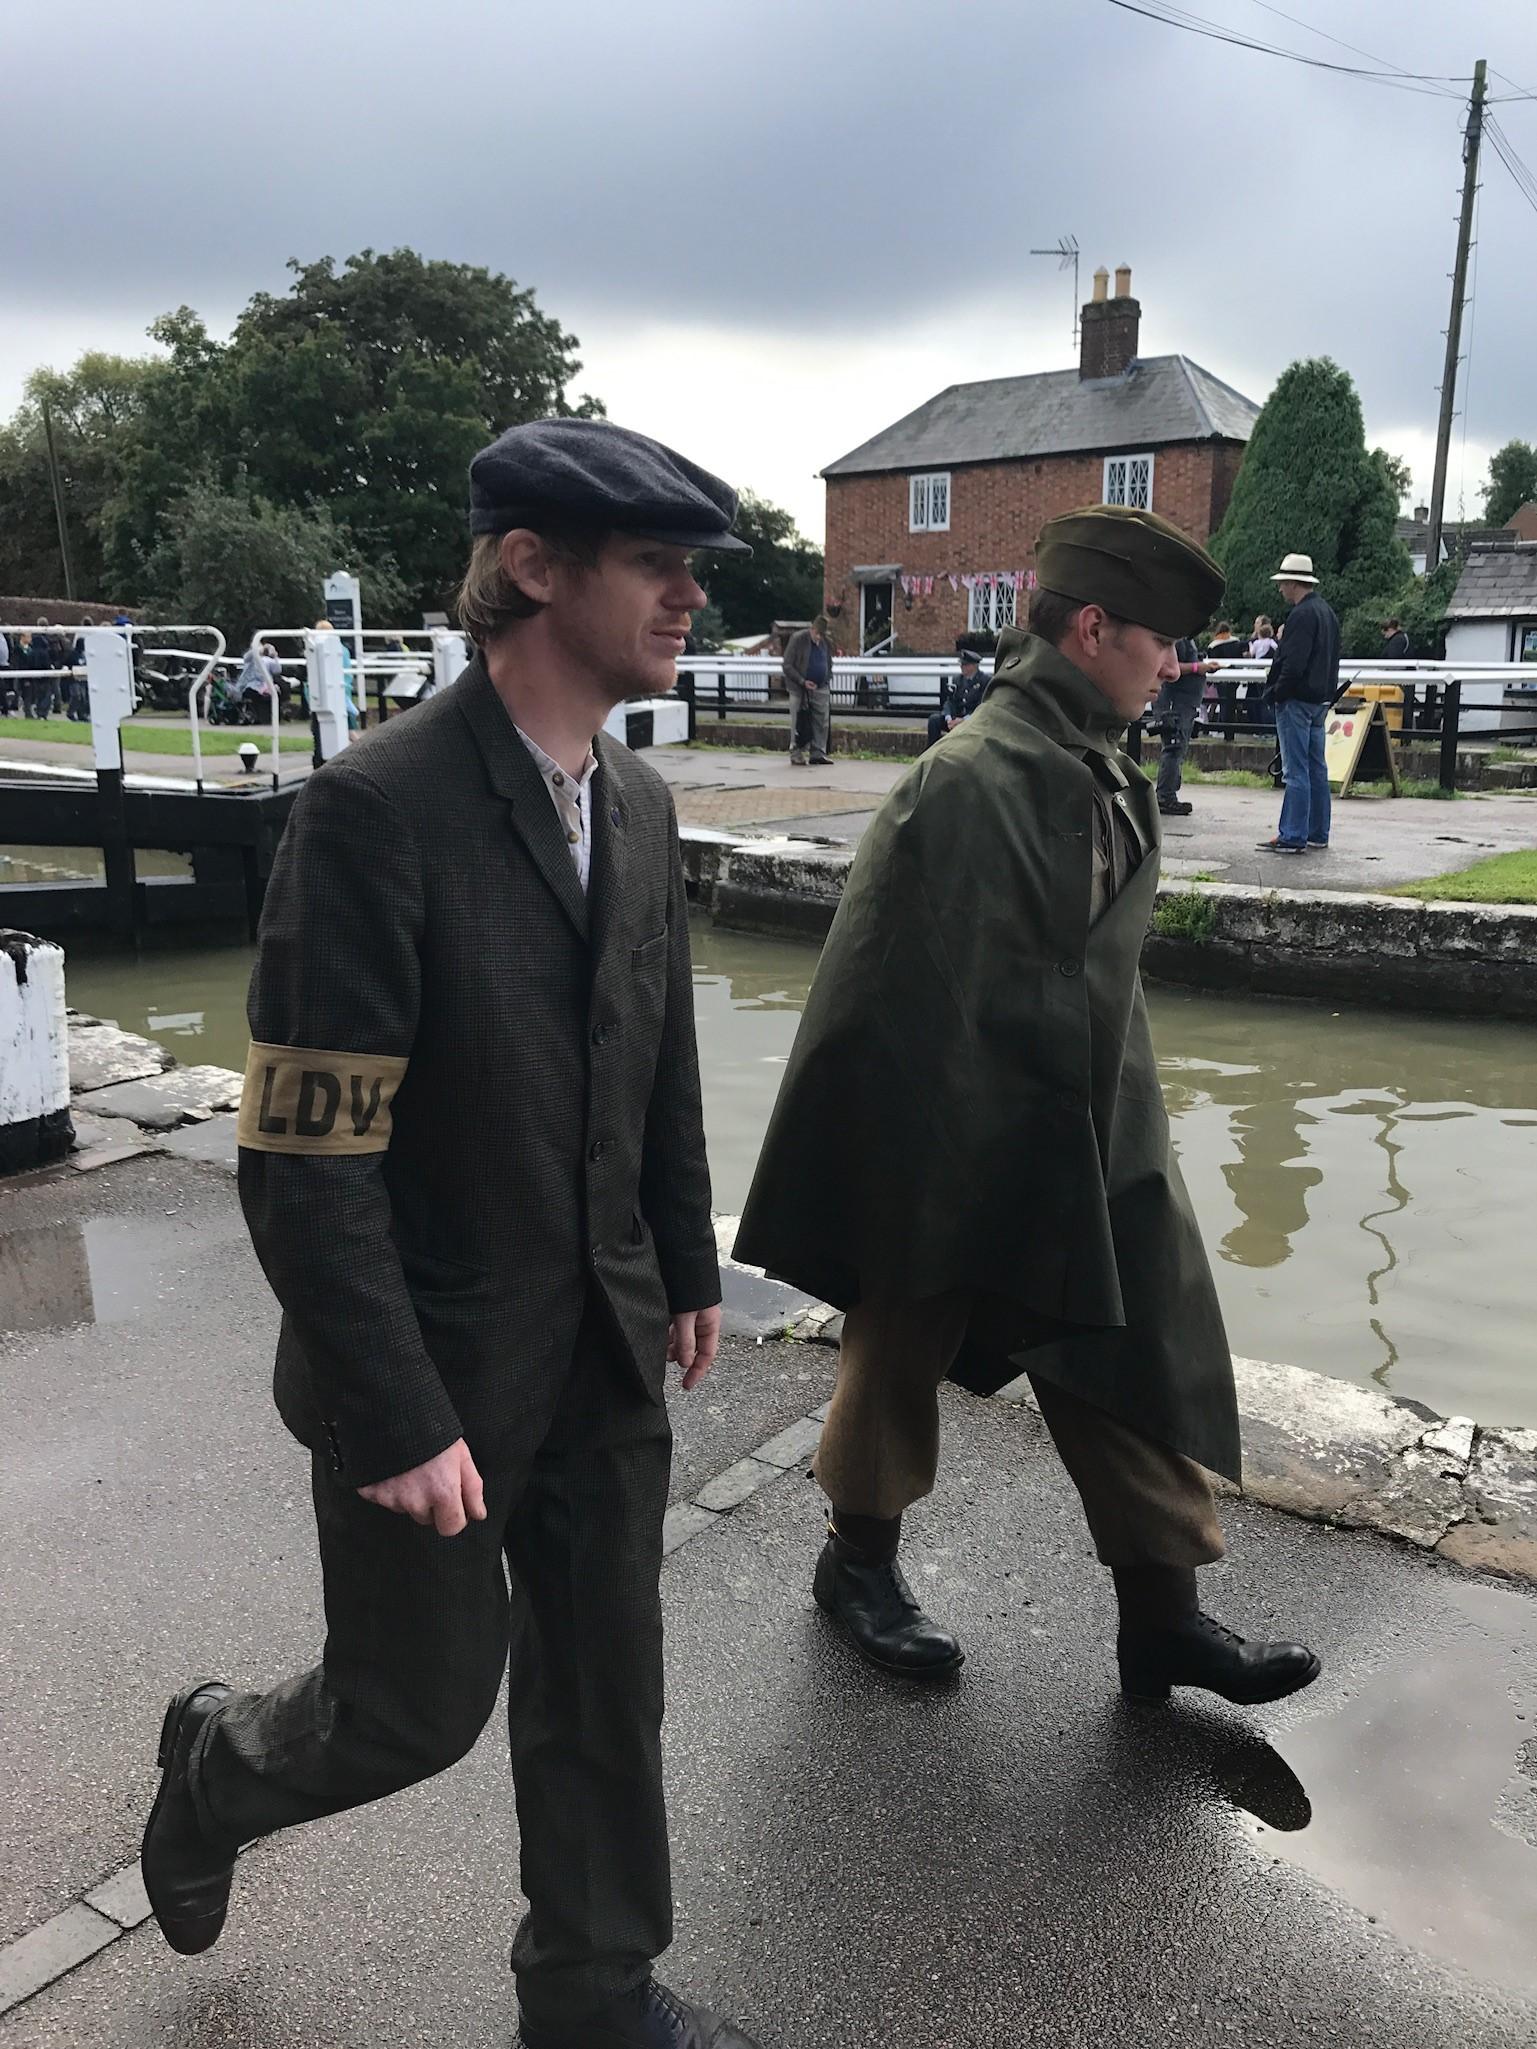 20170909 Village At War Stoke Bruene [03].jpg